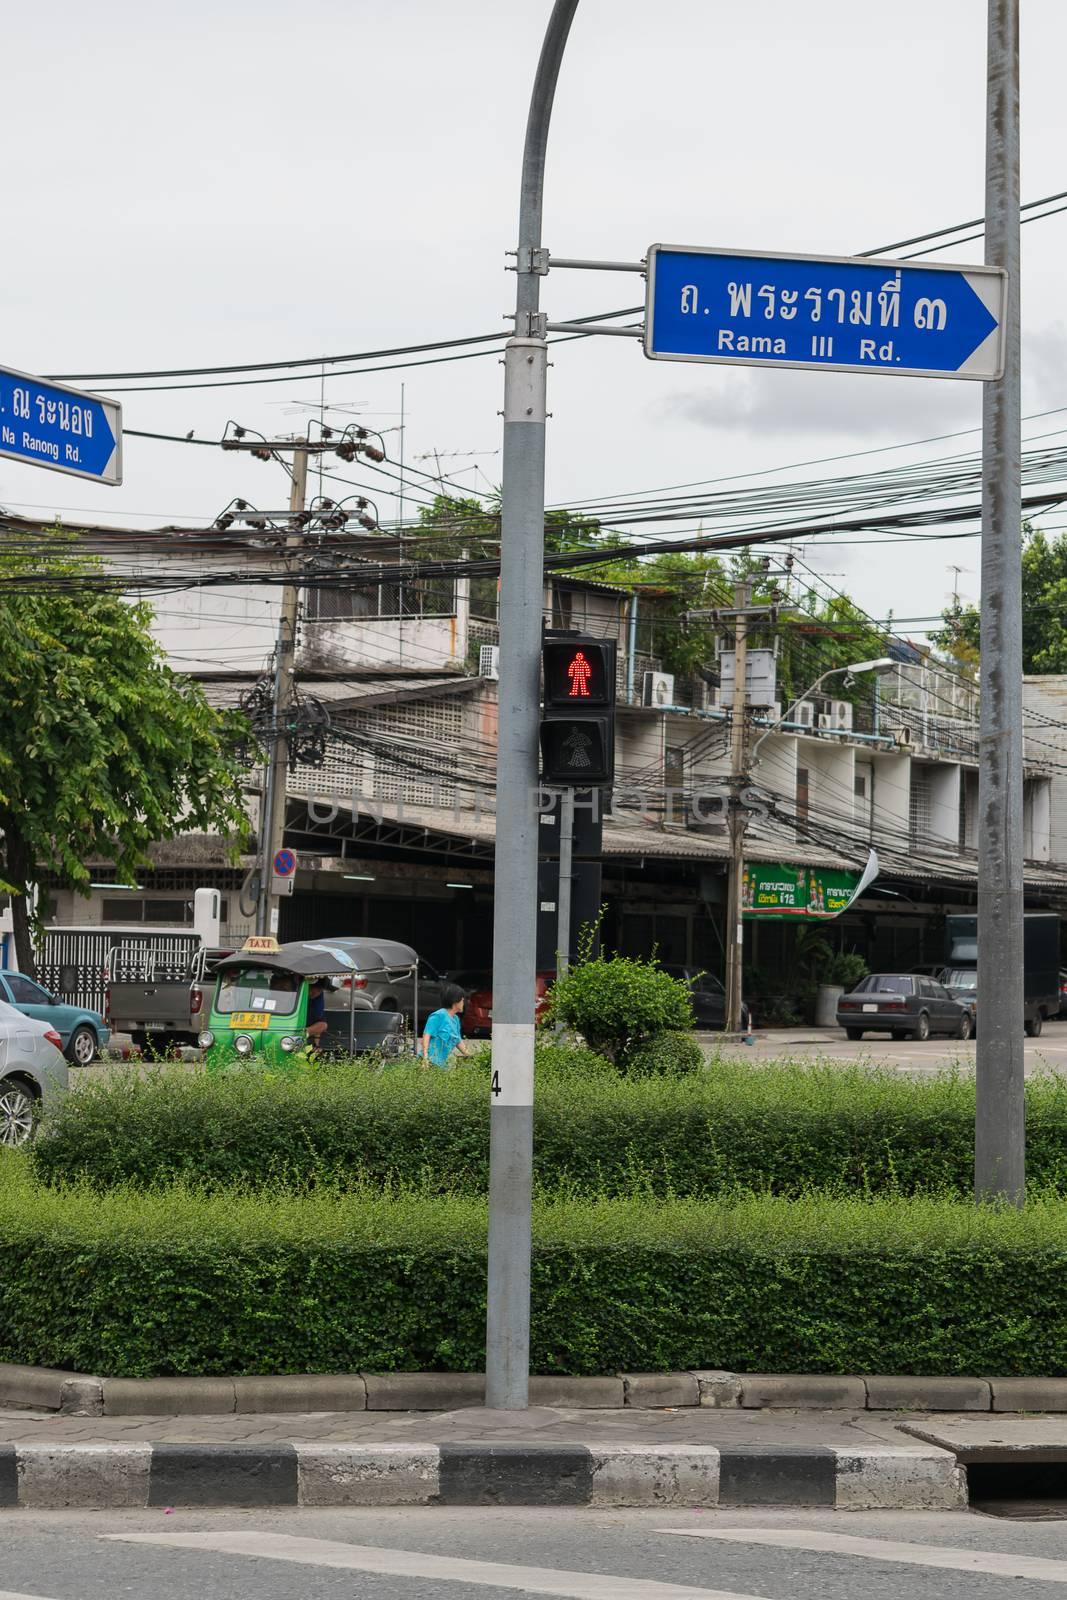 Bangkok, Thailand - July 19, 2015 : Transportation in Bangkok city. Bangkok is the capital and the most populous city of Thailand.